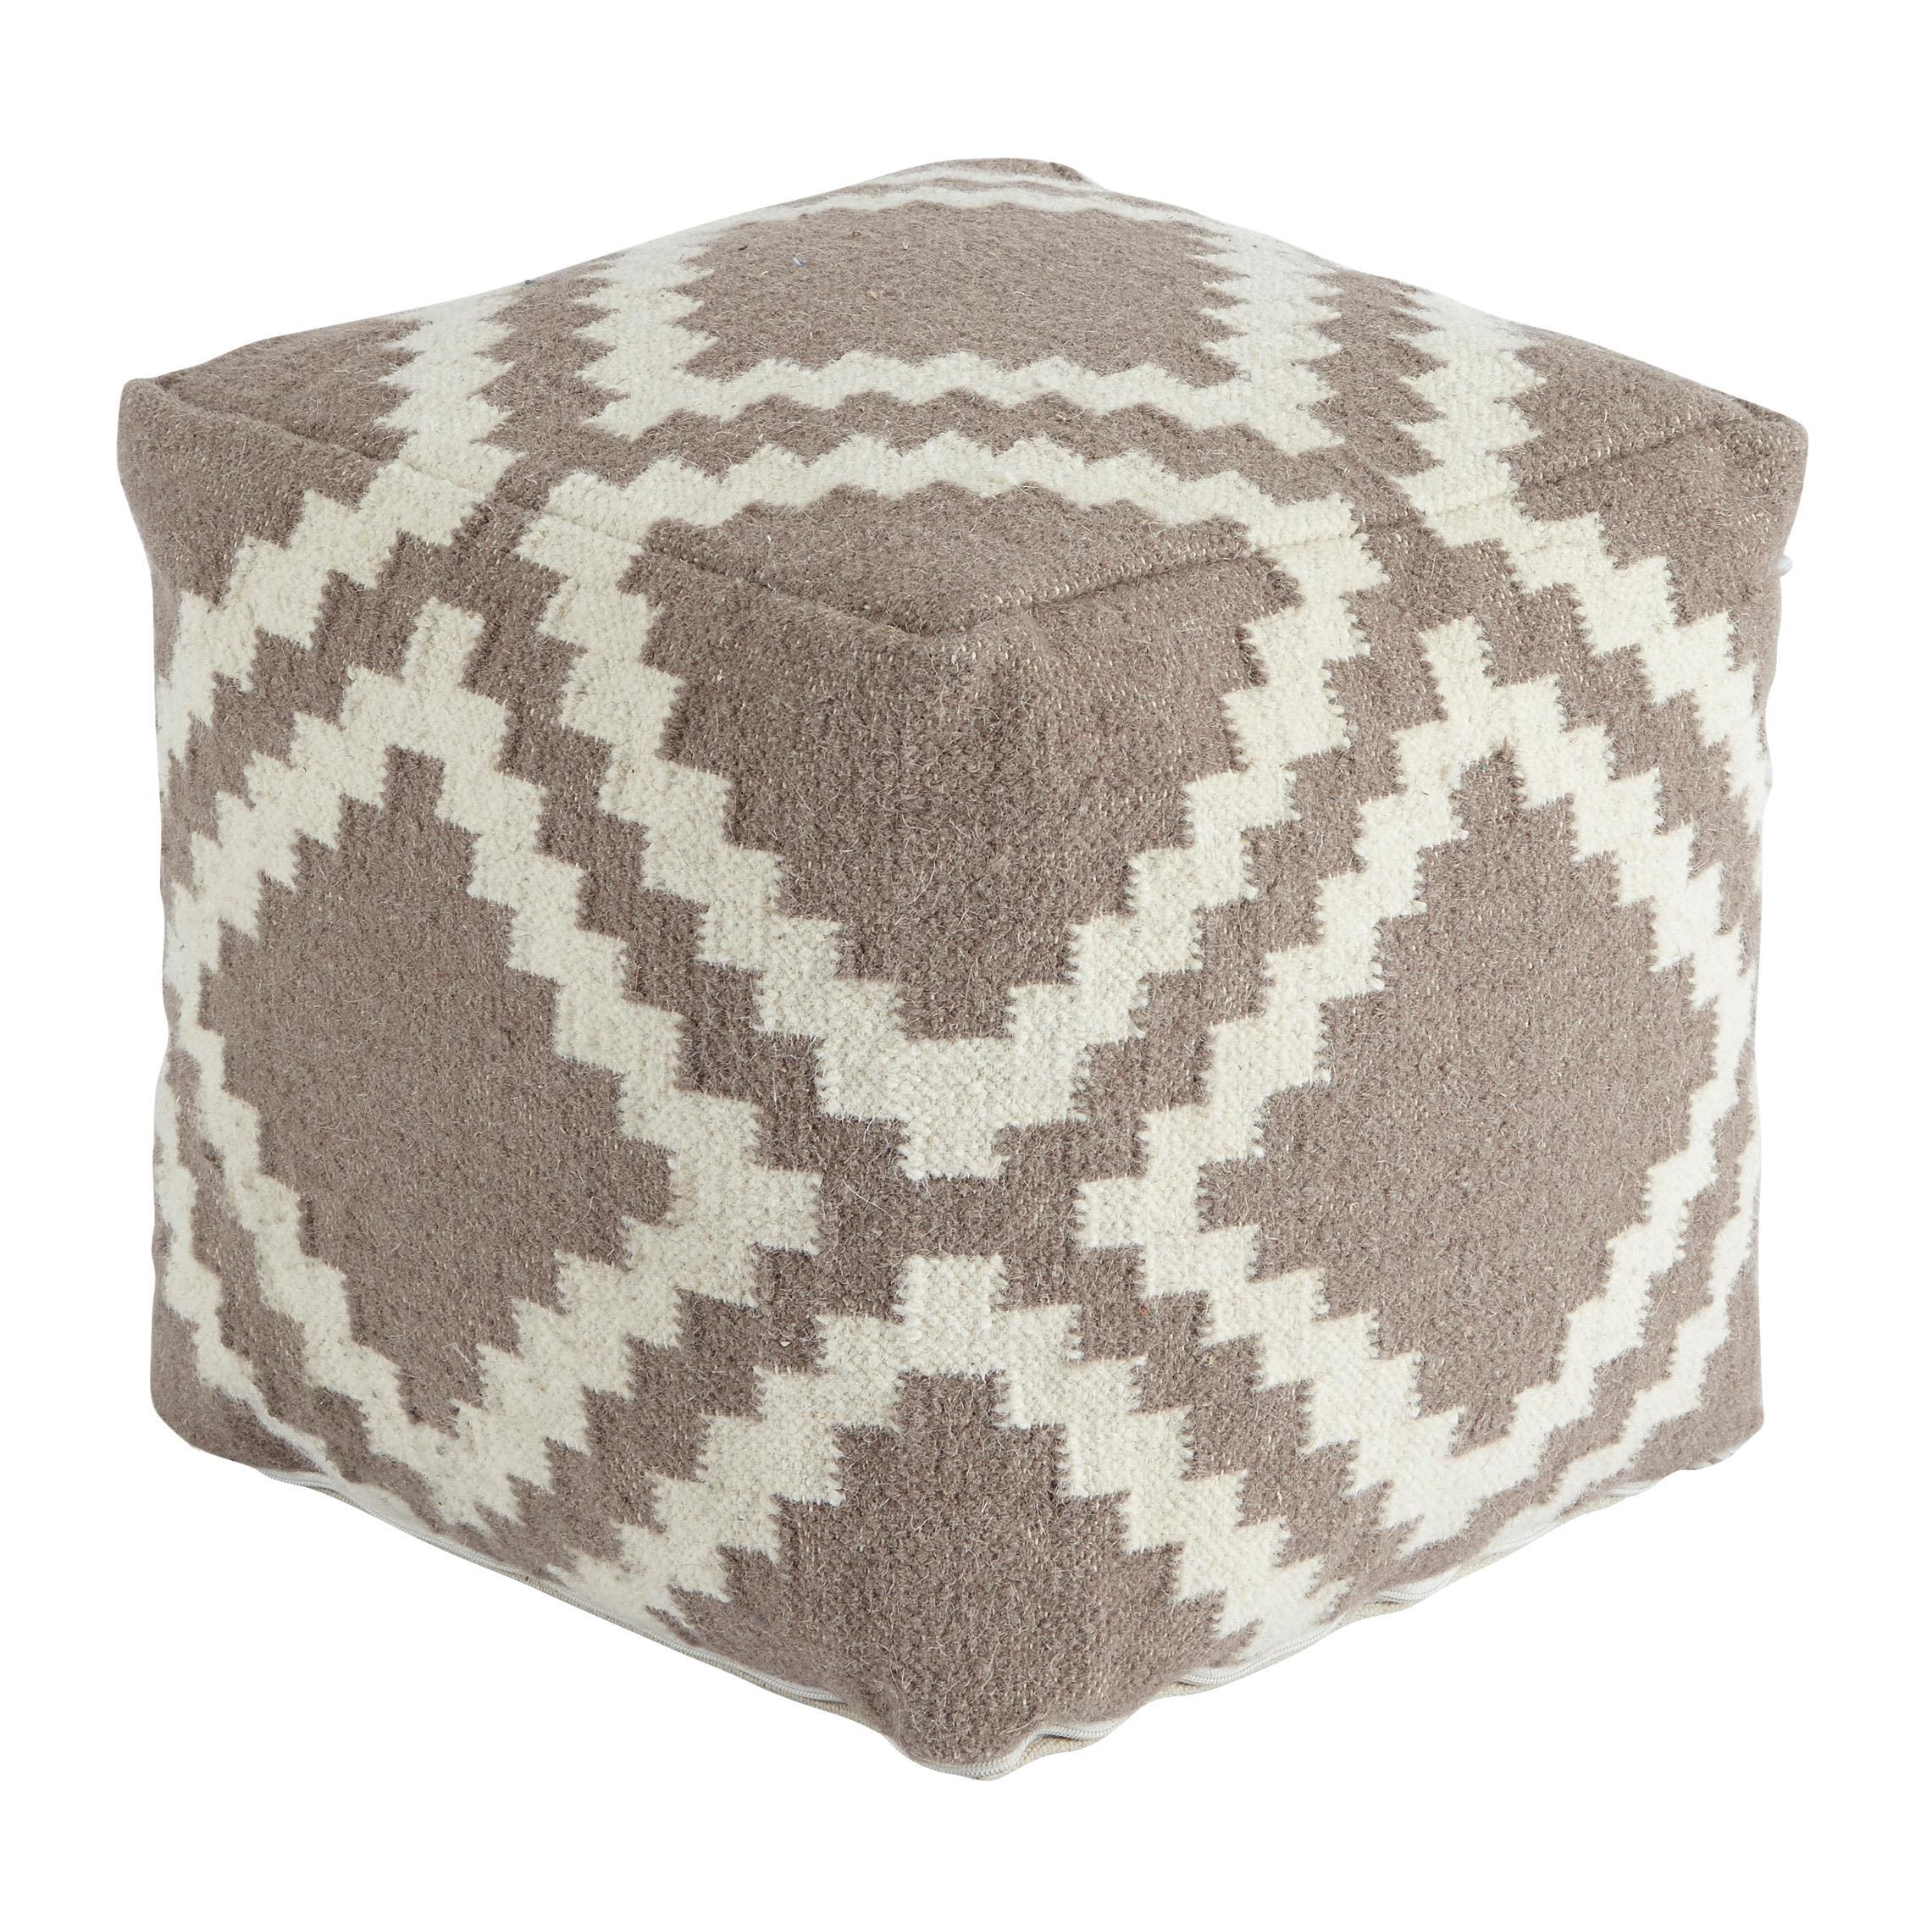 signature design by ashley poufs a1000418 geometric gray. Black Bedroom Furniture Sets. Home Design Ideas